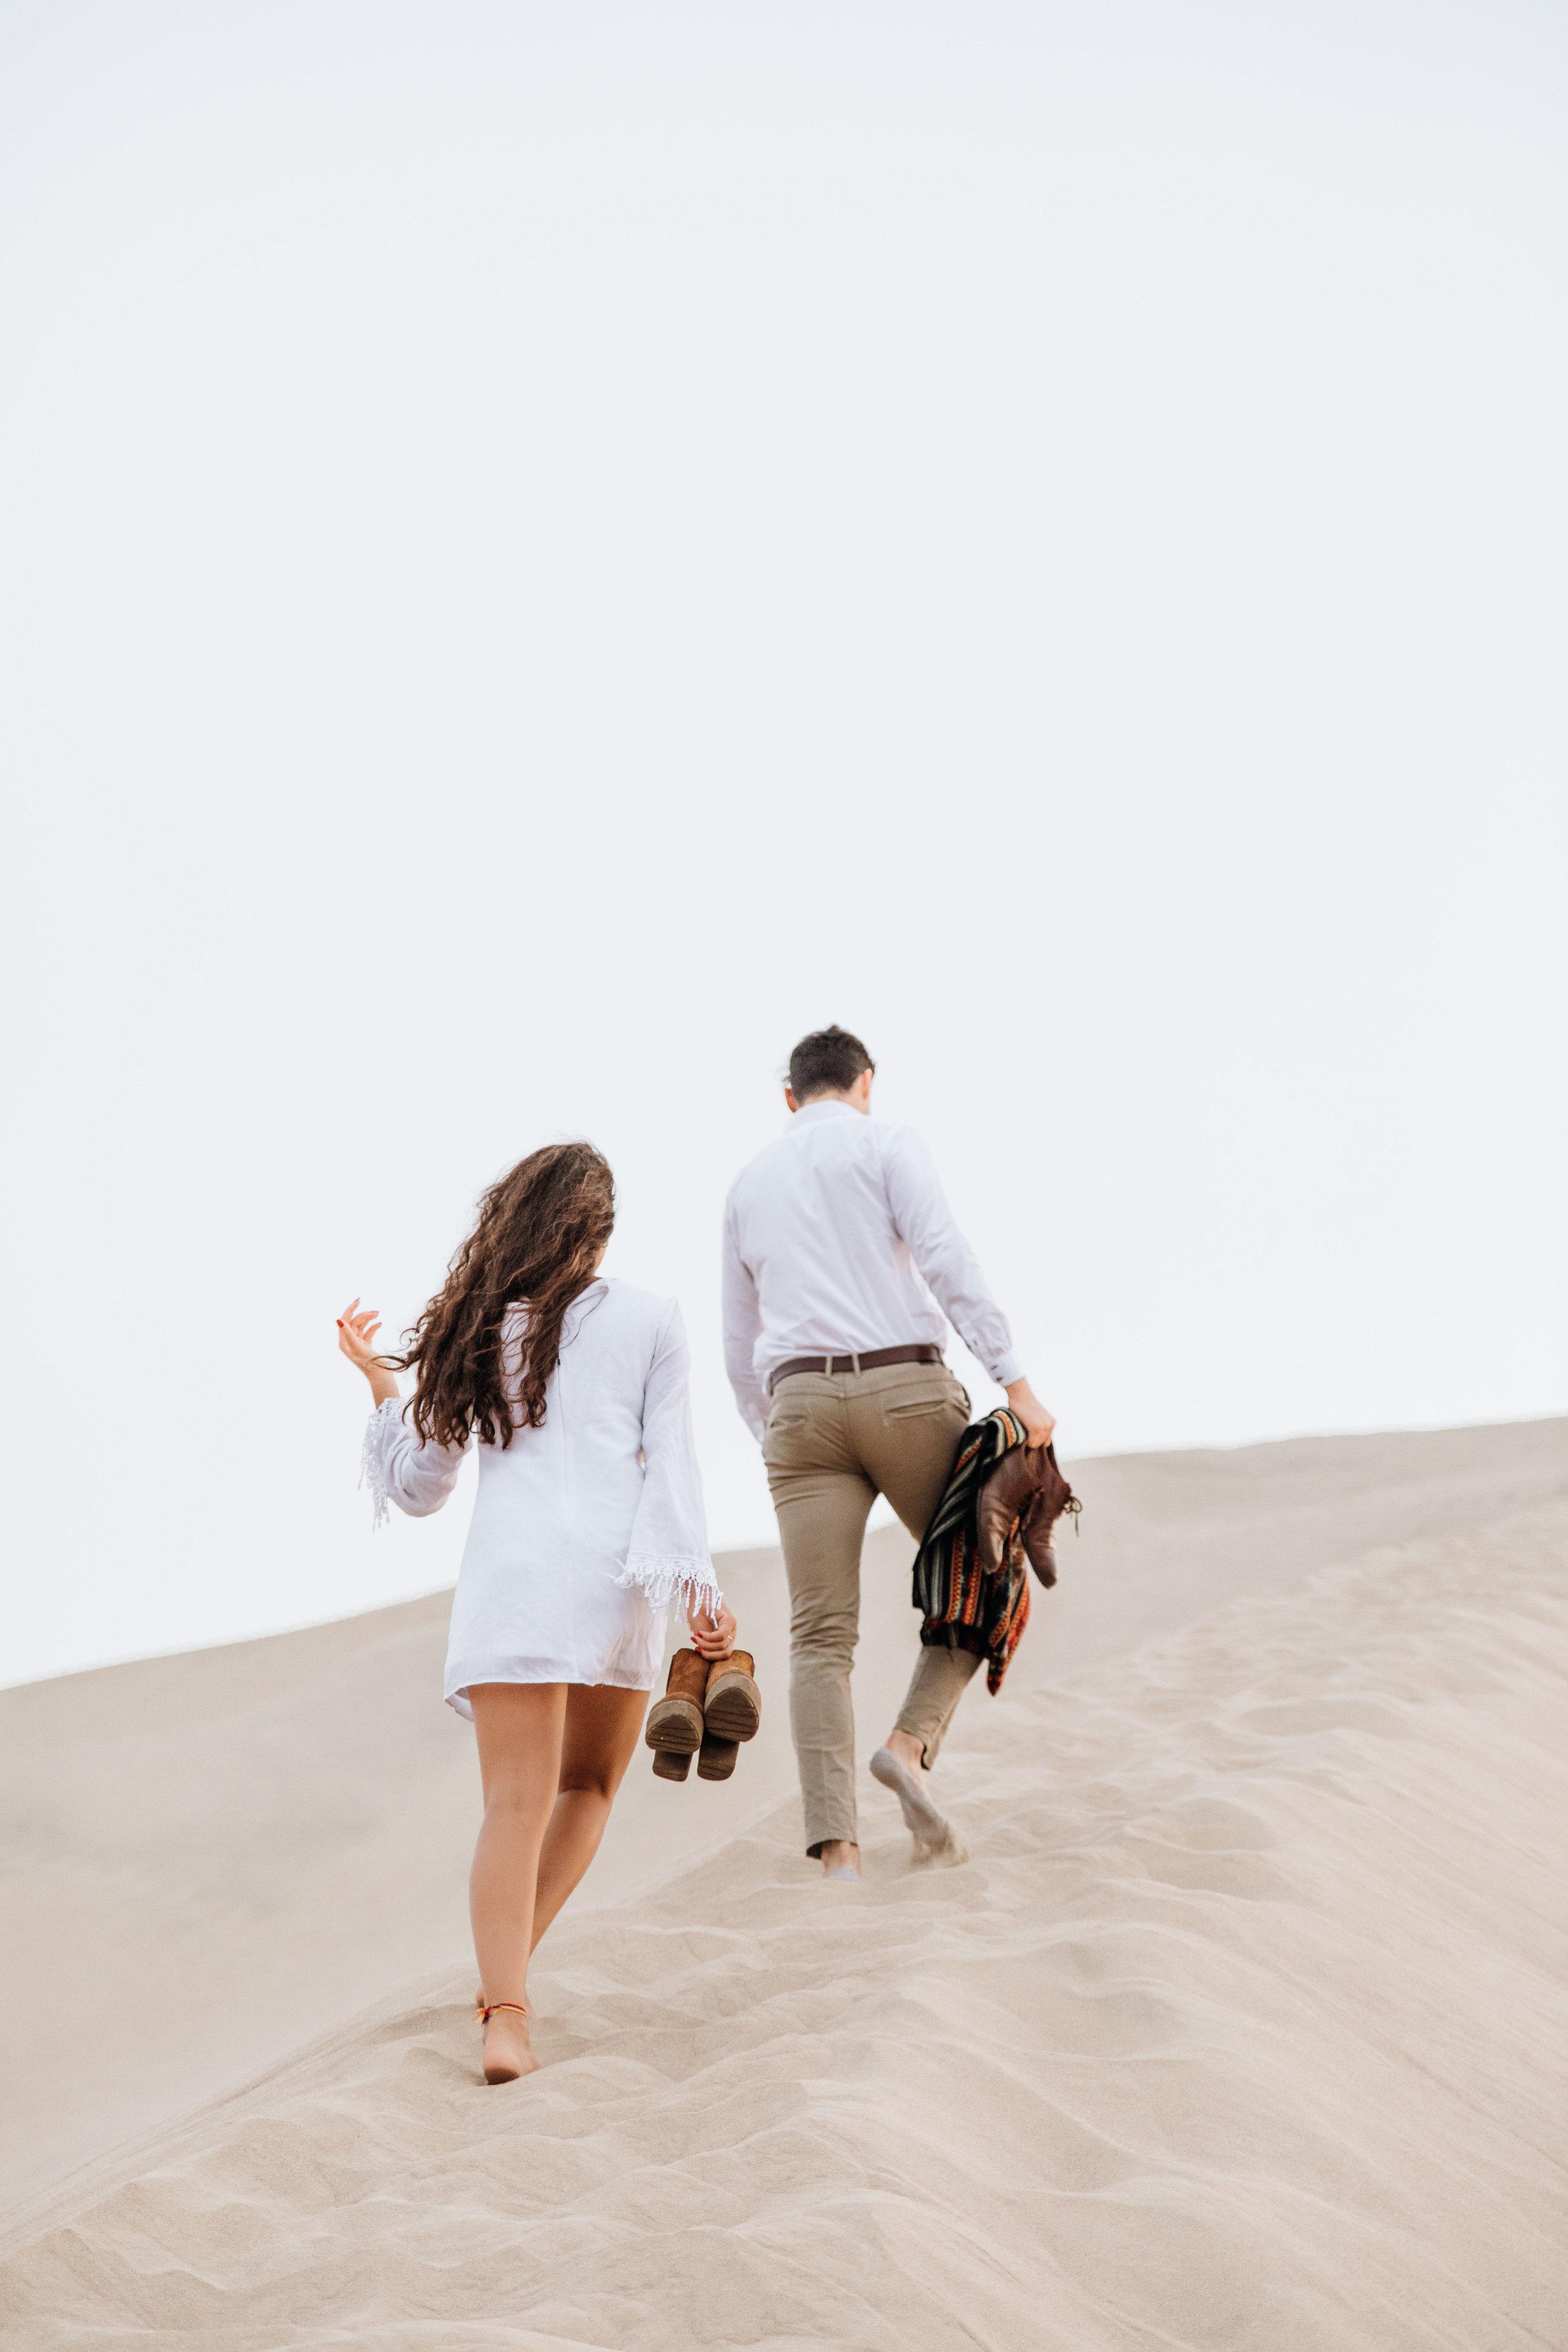 huacachina-peru-honeymoon-elopement-destination-wedding-photography-michael-cozzens-6.jpg